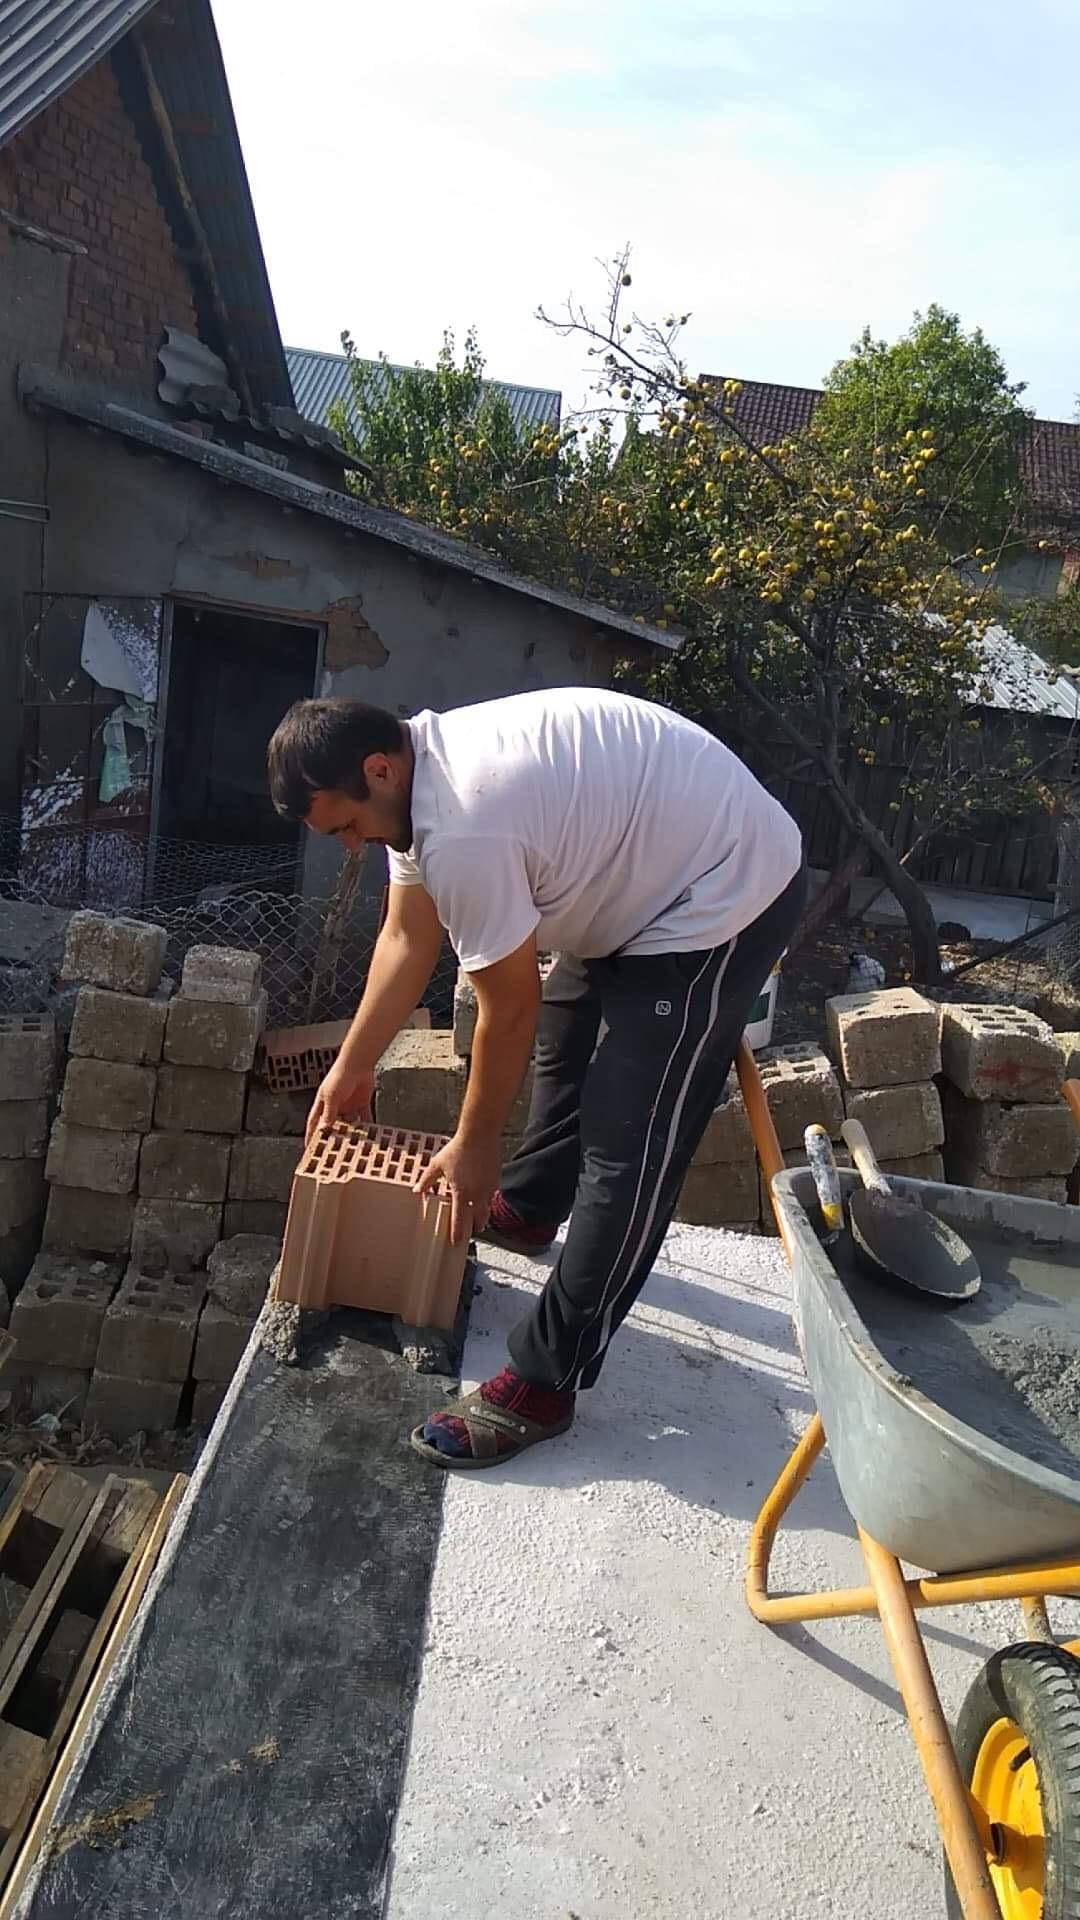 First brick - PRAISE GOD!